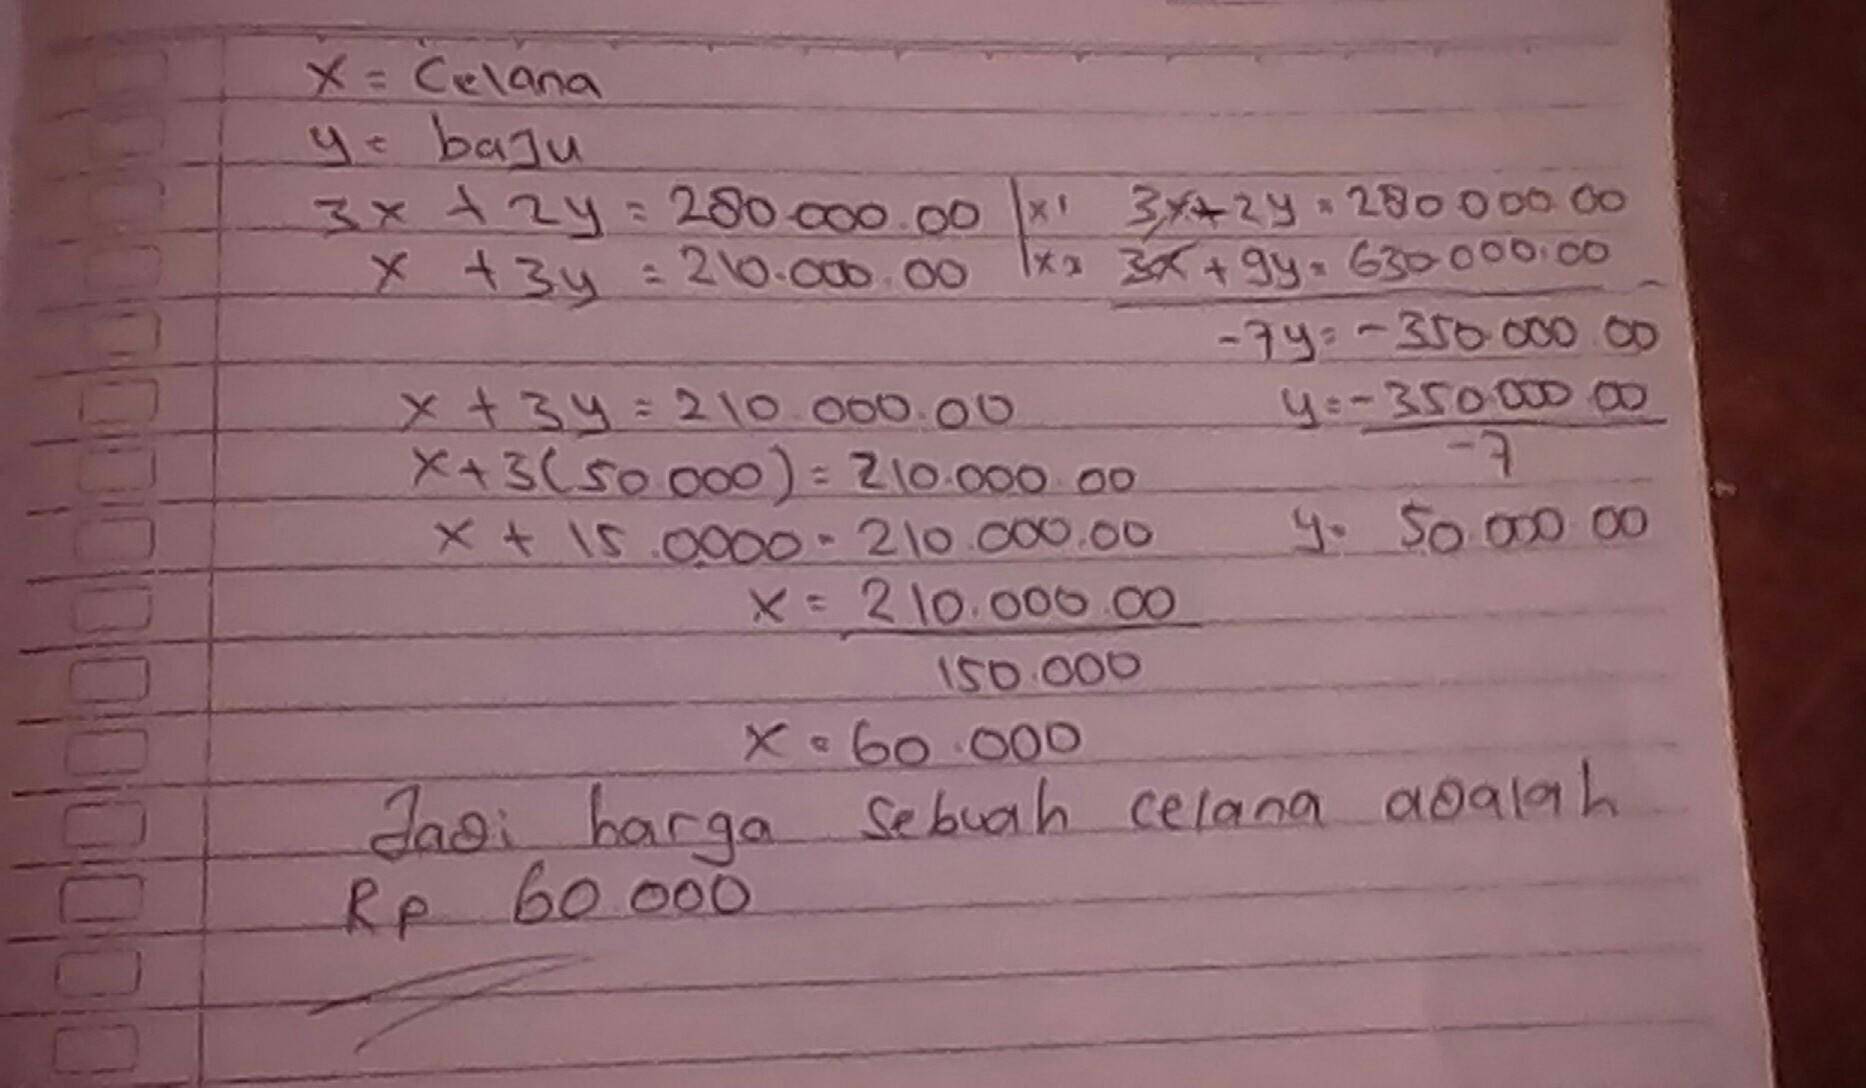 Harga 3 Celana Dan 2 Baju Adalah Rp28000000 Sedangkan Harga 1